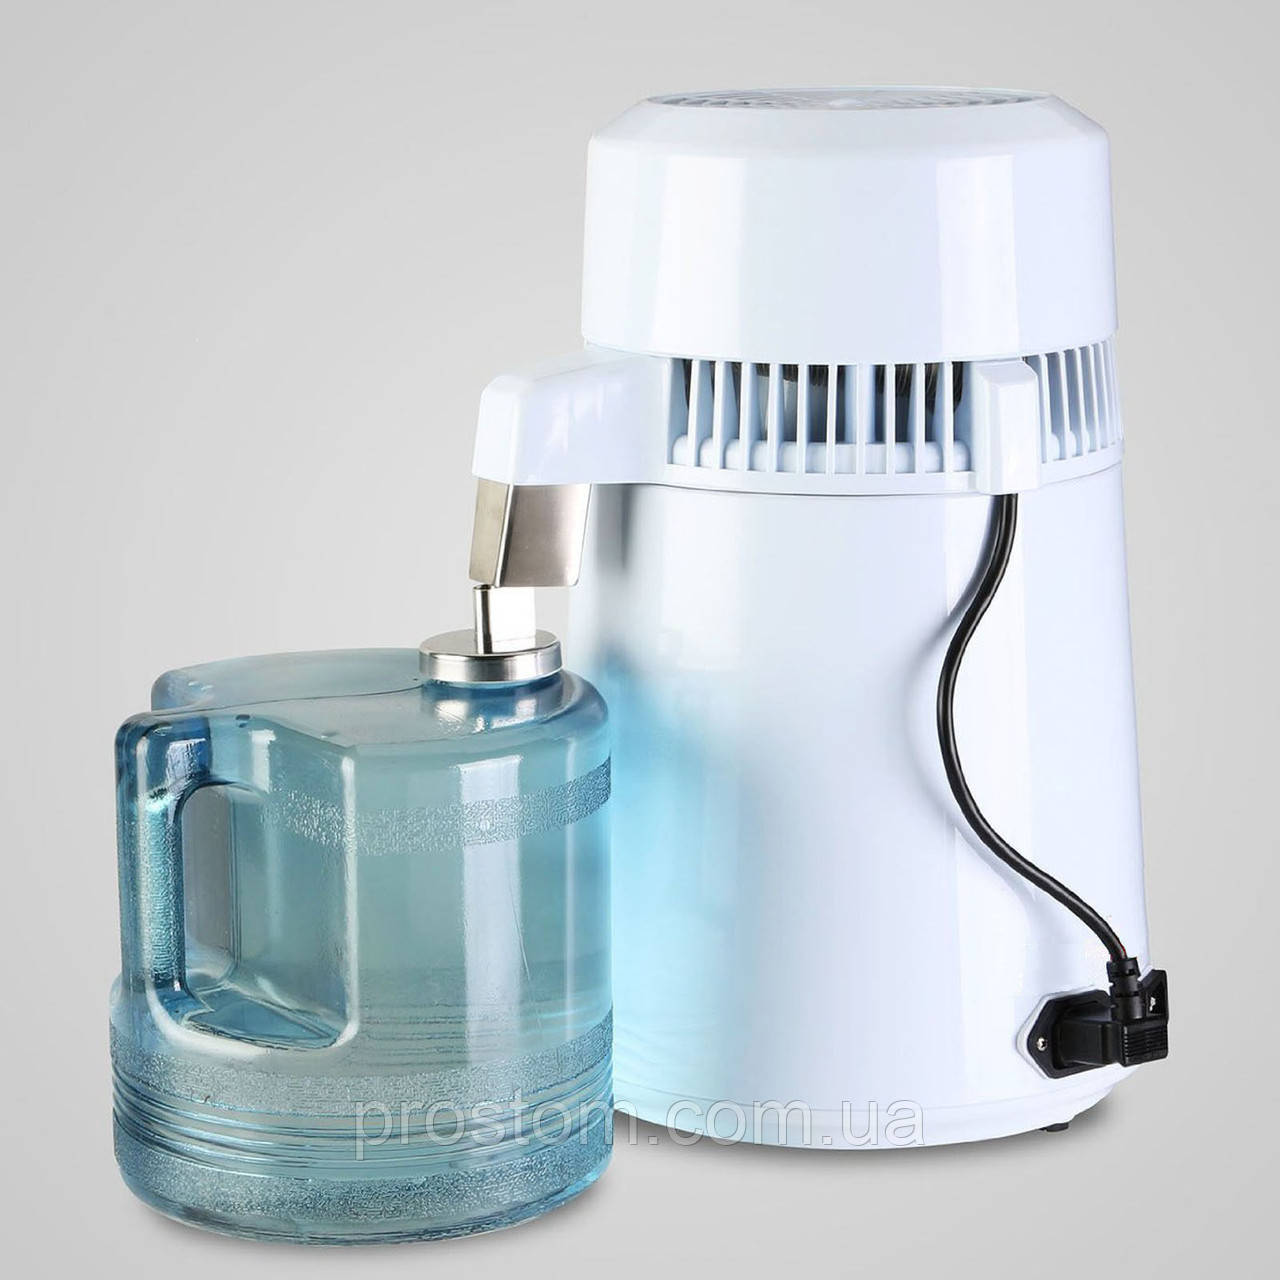 Дистиллятор DRINK (тип А)